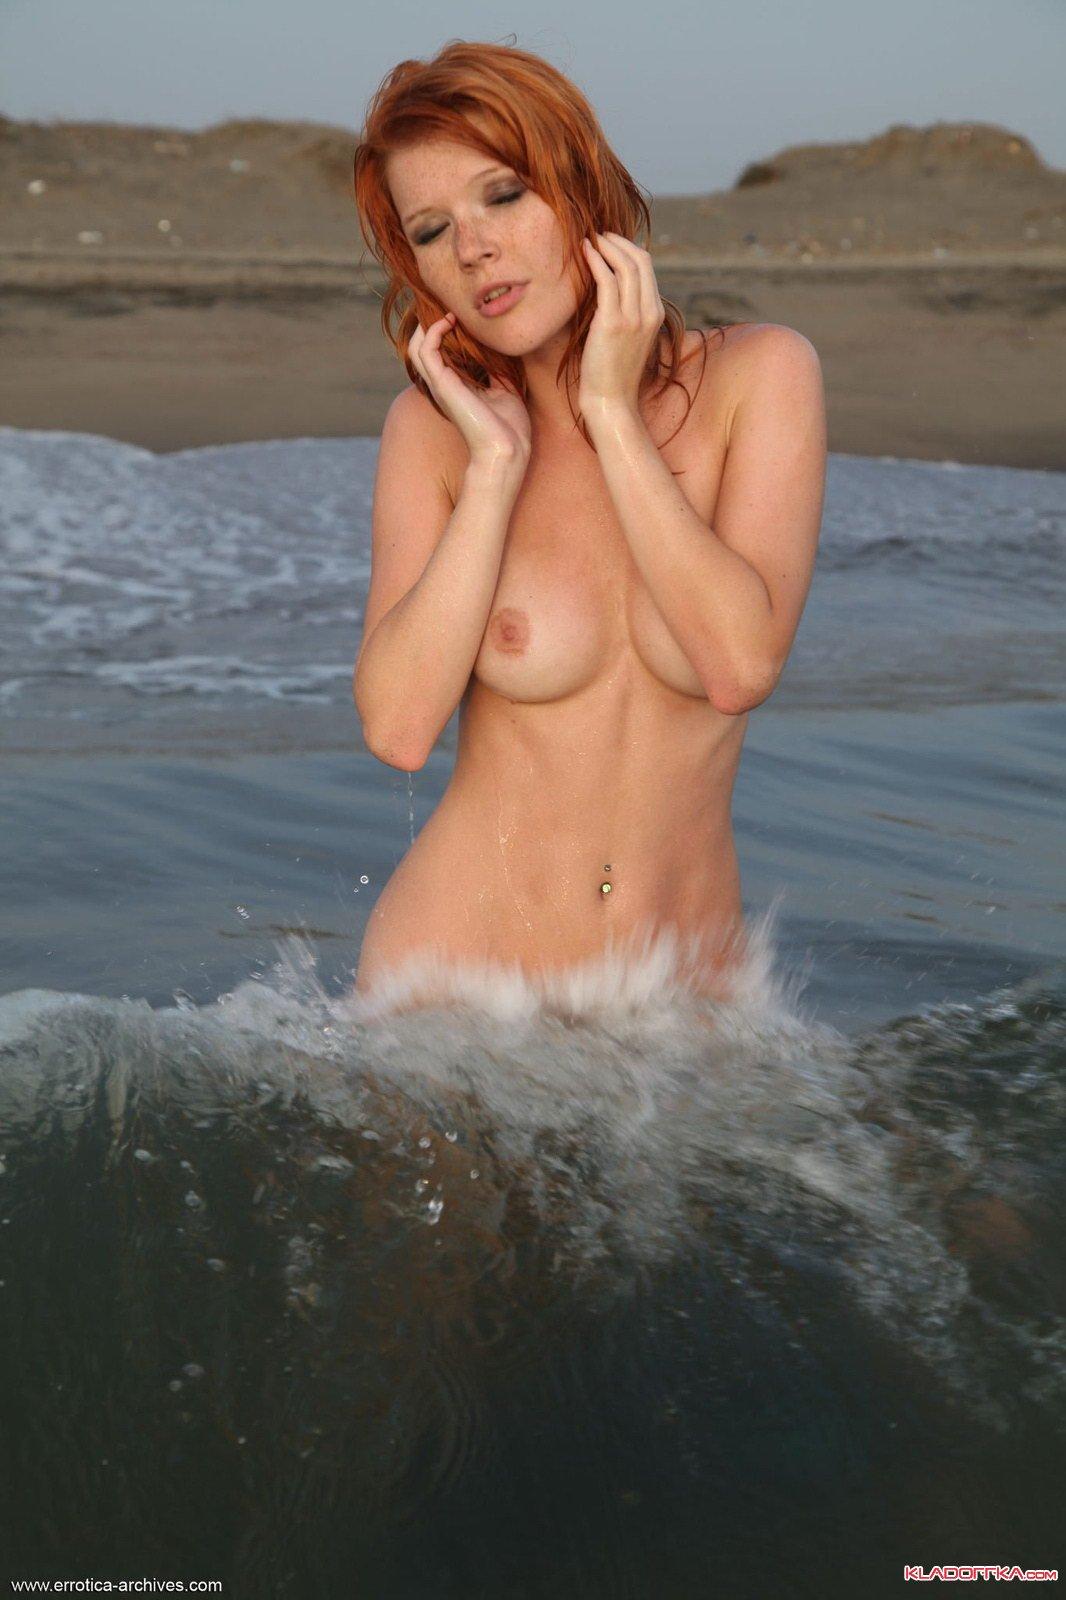 Эротика фото голых девушек на goloeme